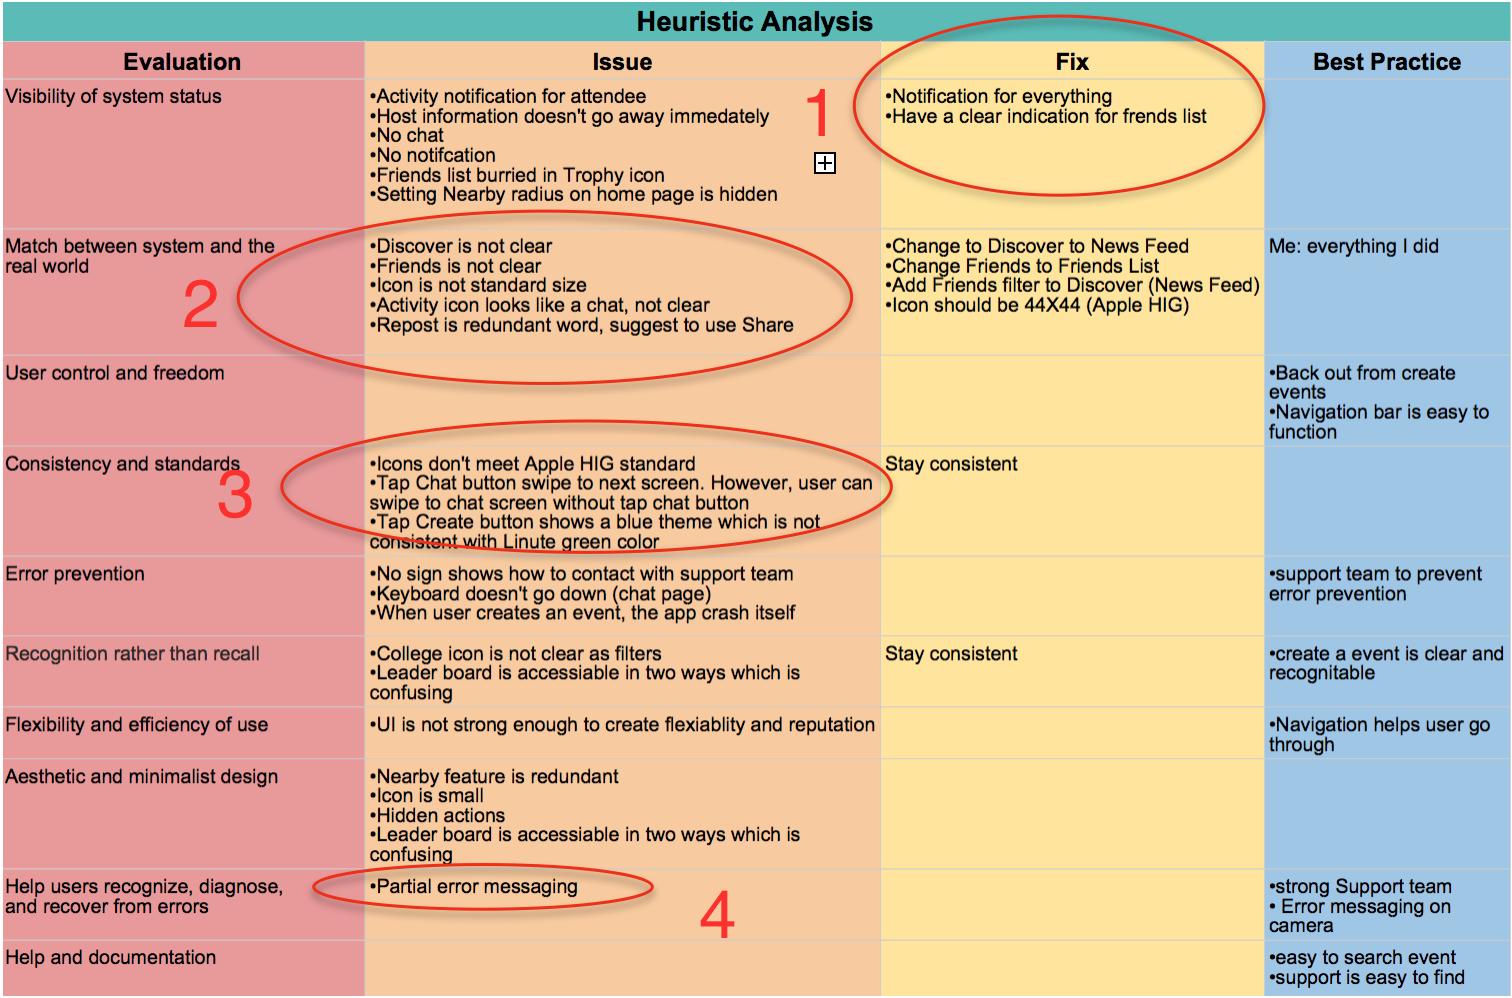 heurstic analysis.png